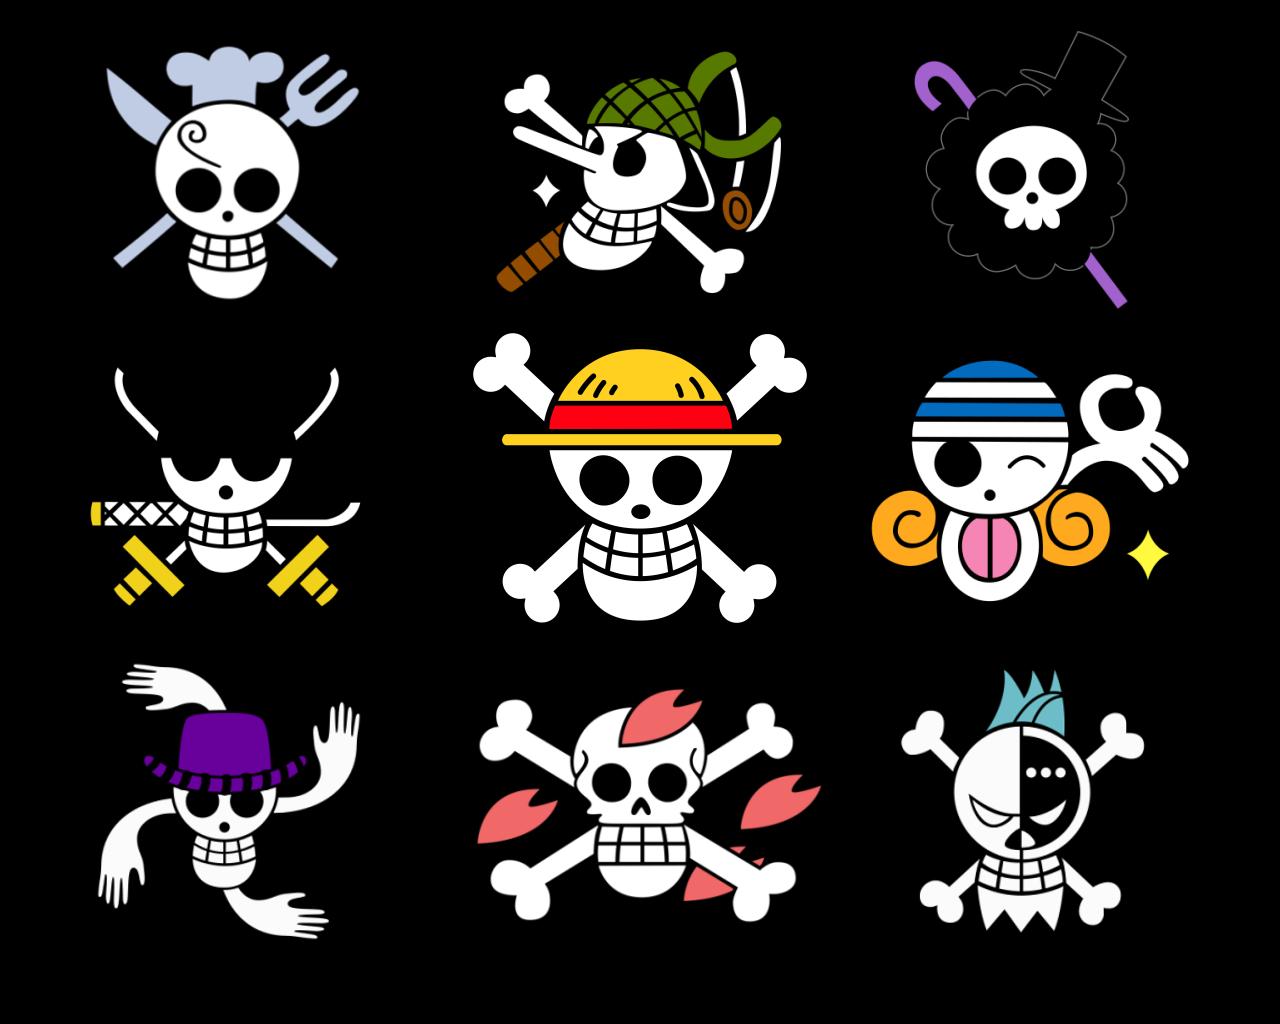 Black Panther S Den Fan Art One Piece Flags One Piece Logo One Piece Anime One Piece Manga